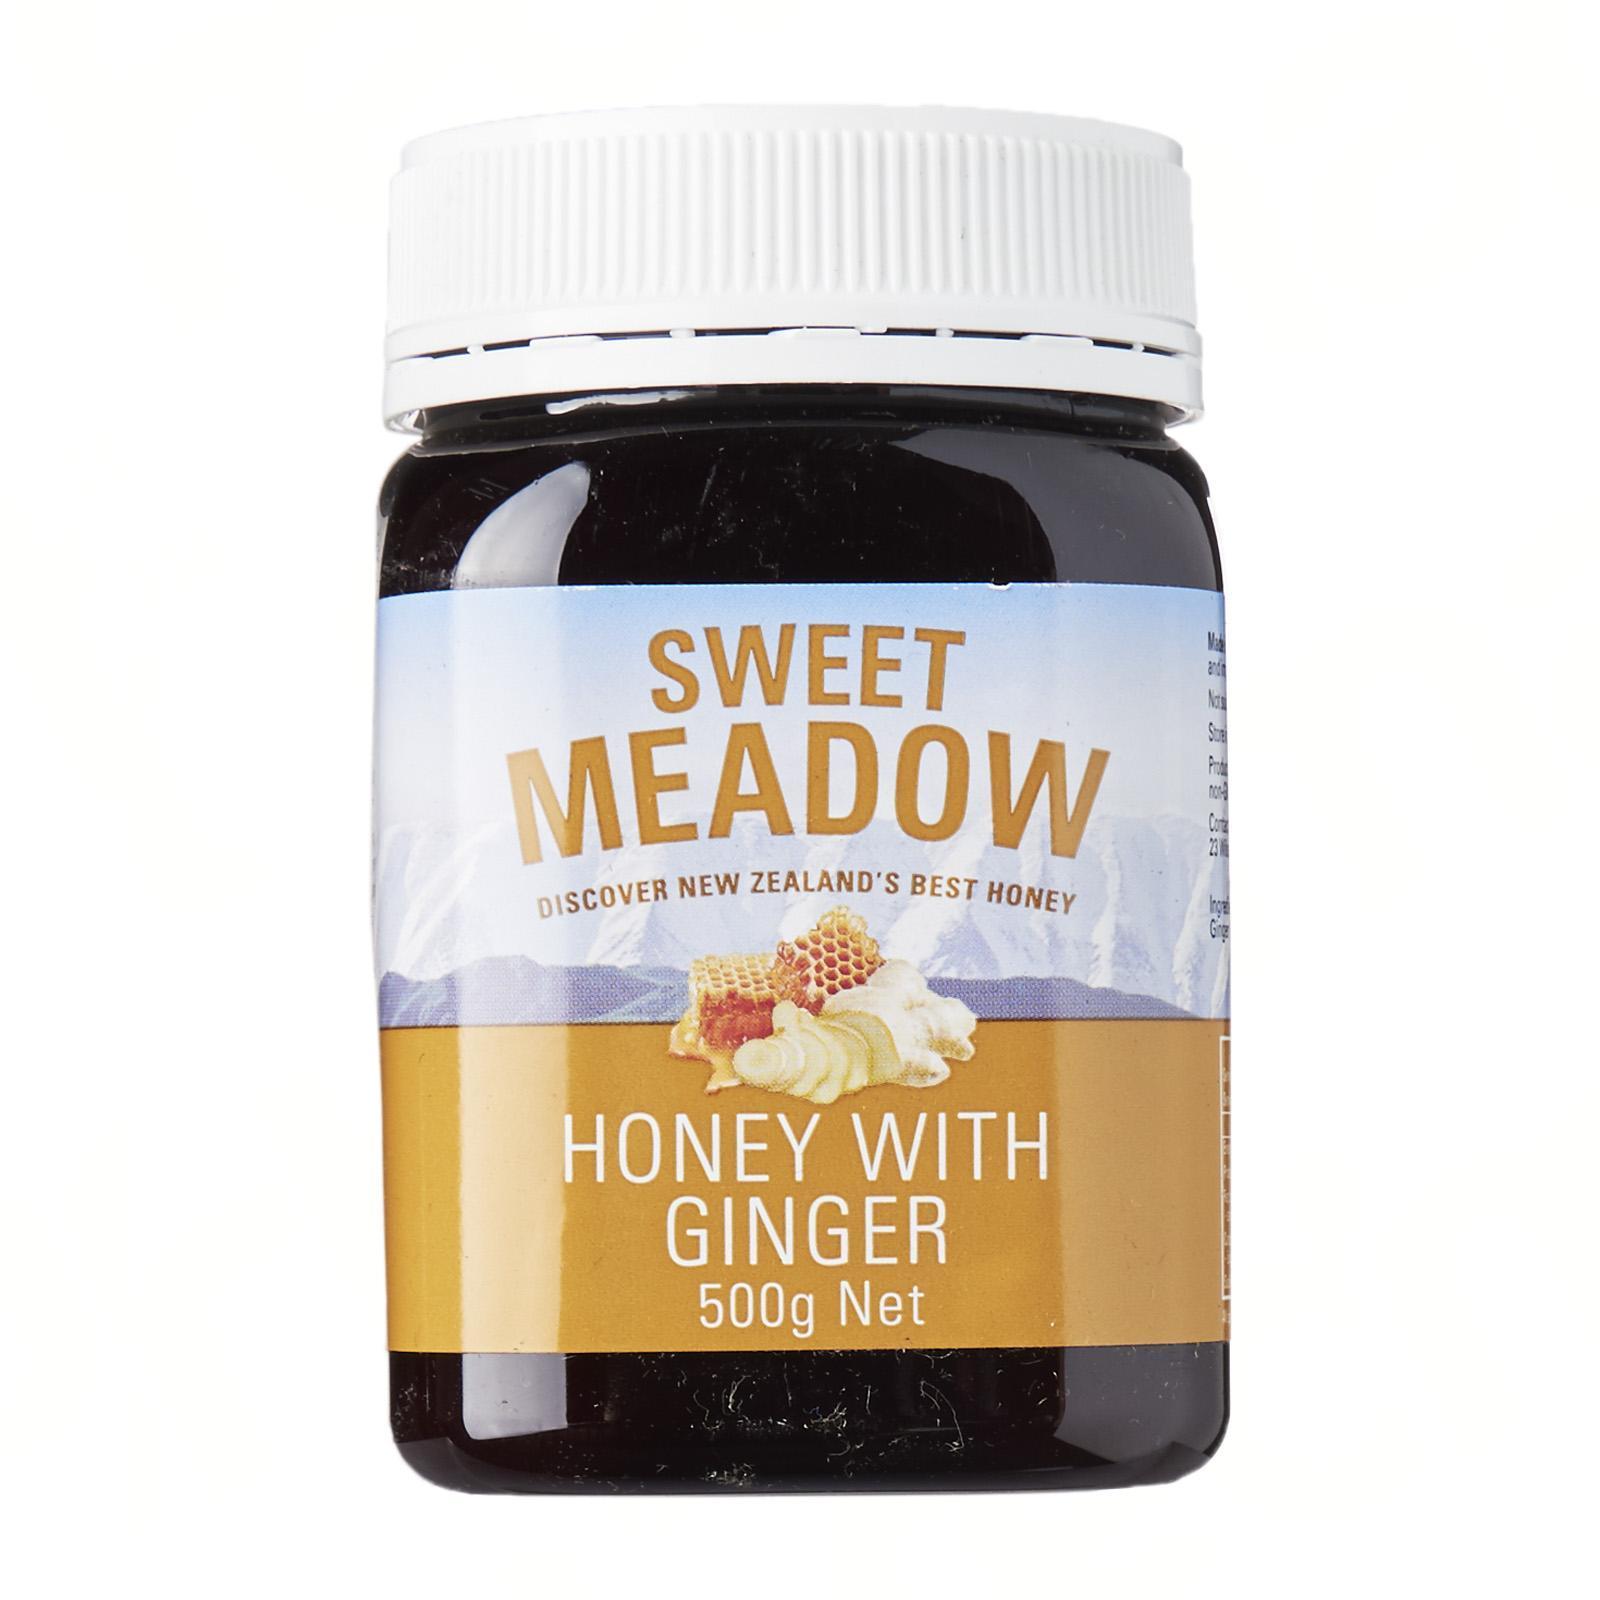 SWEET MEADOW Honey W/ Ginger 500g